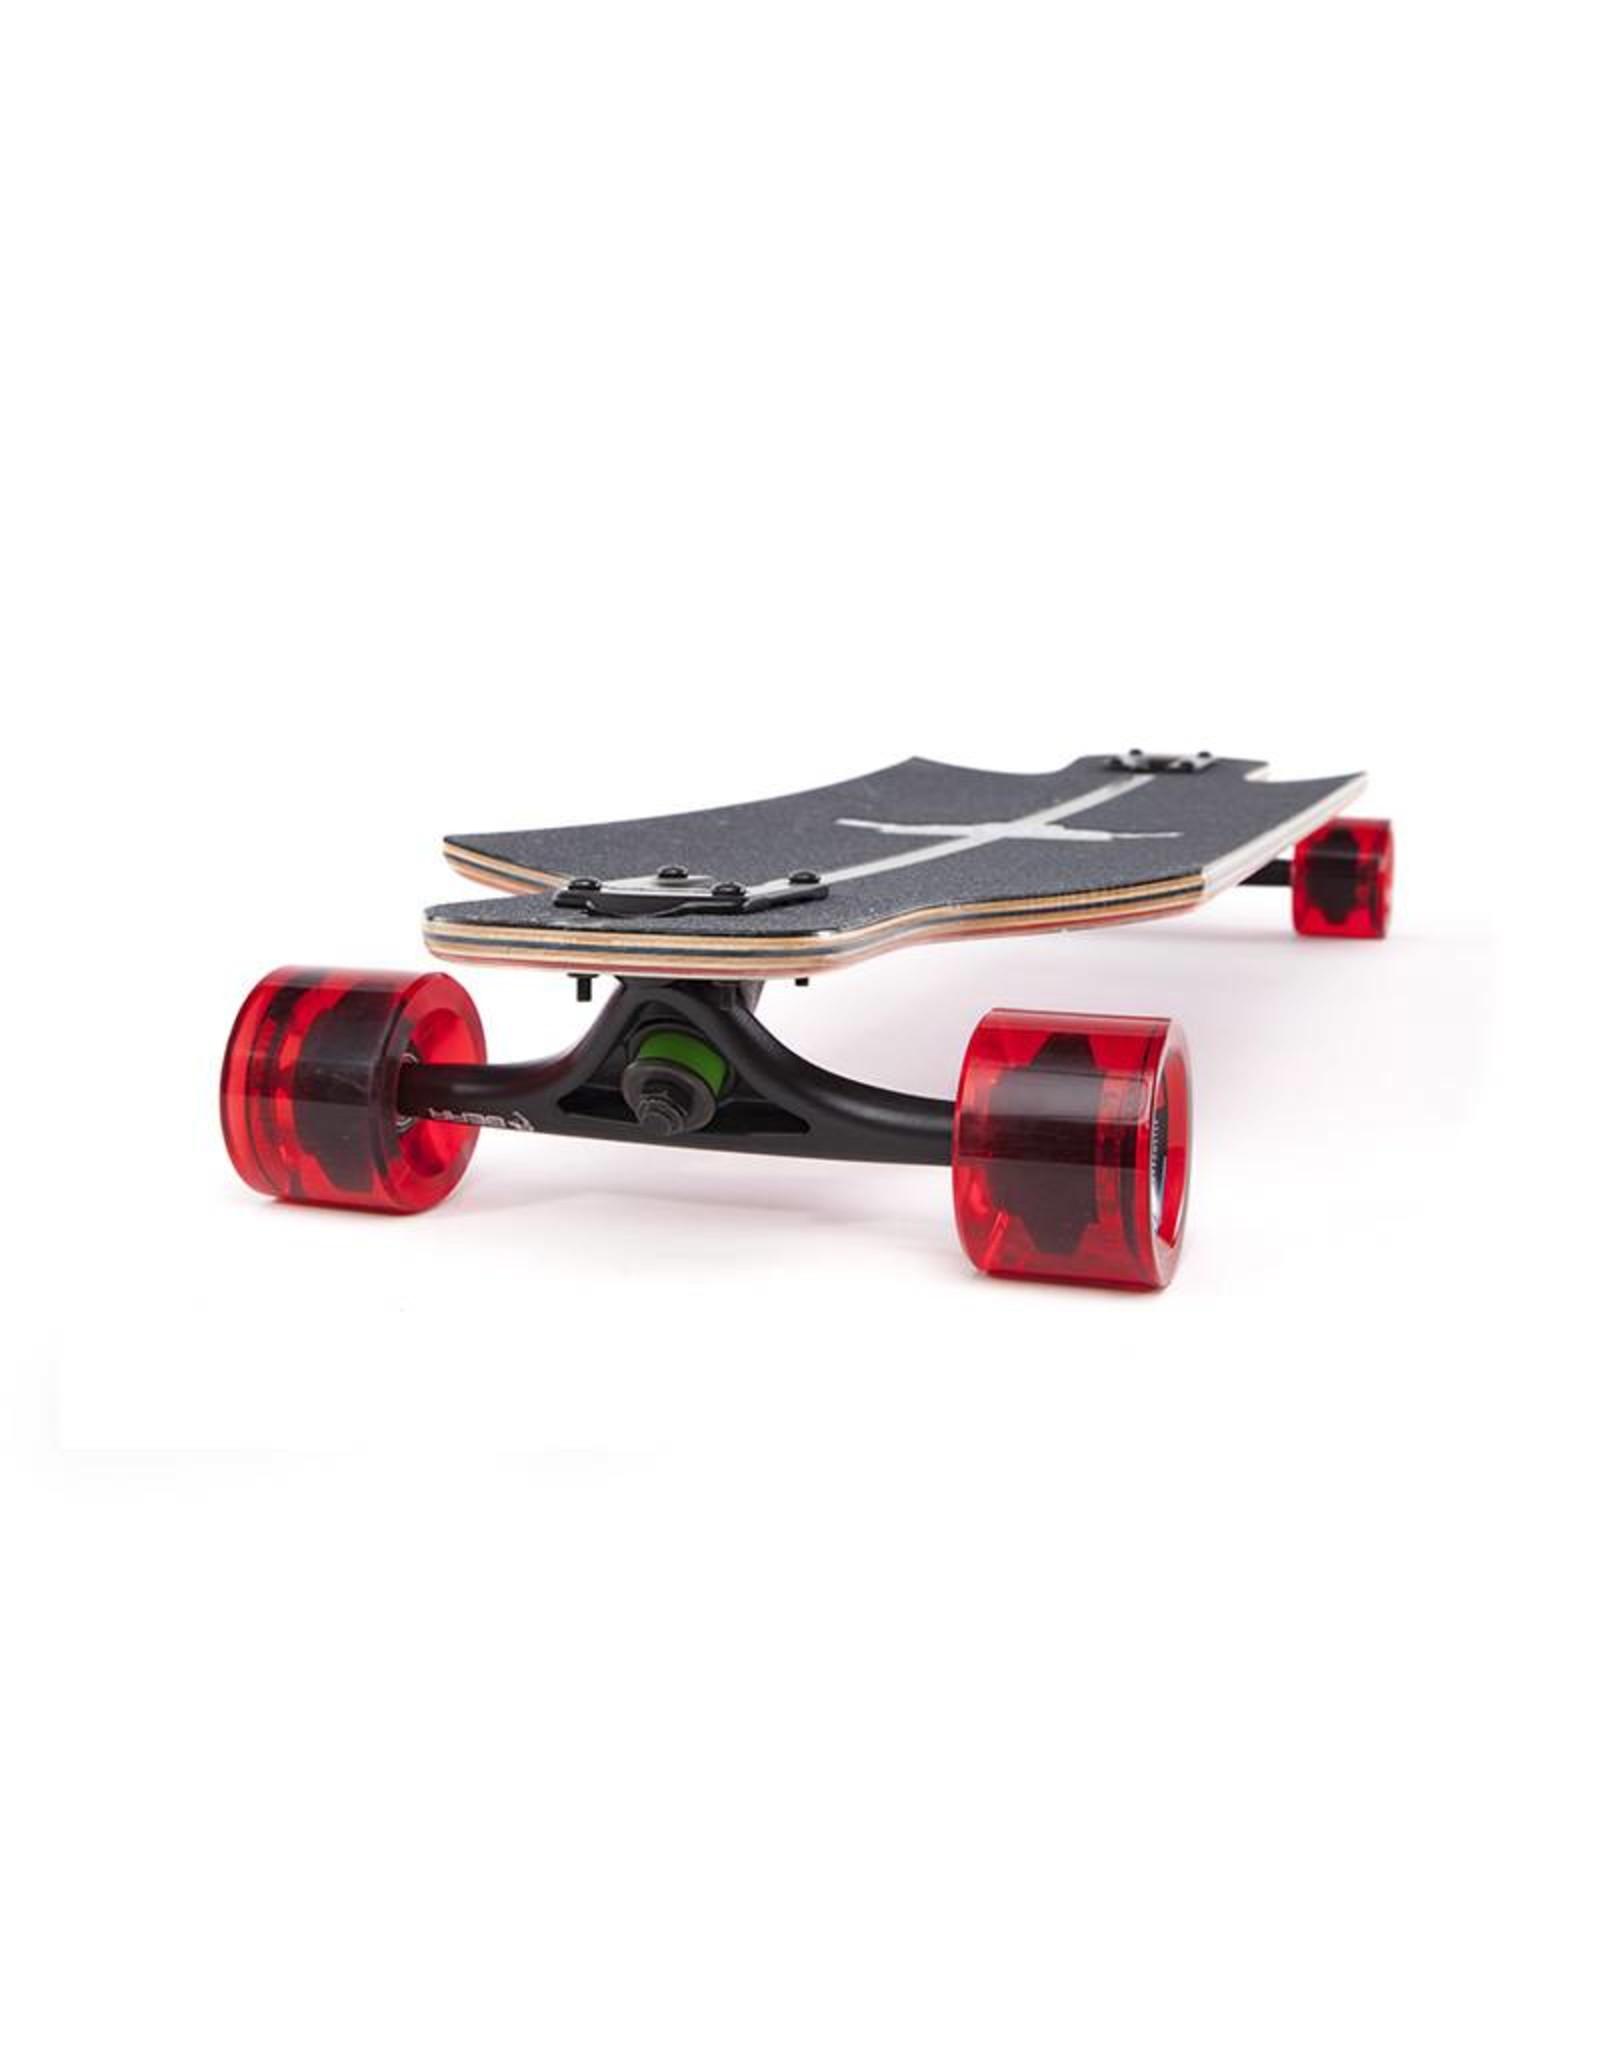 "Landyachtz Landyachtz Maple Drop Hammer 36.5"" Cardinal Complete"